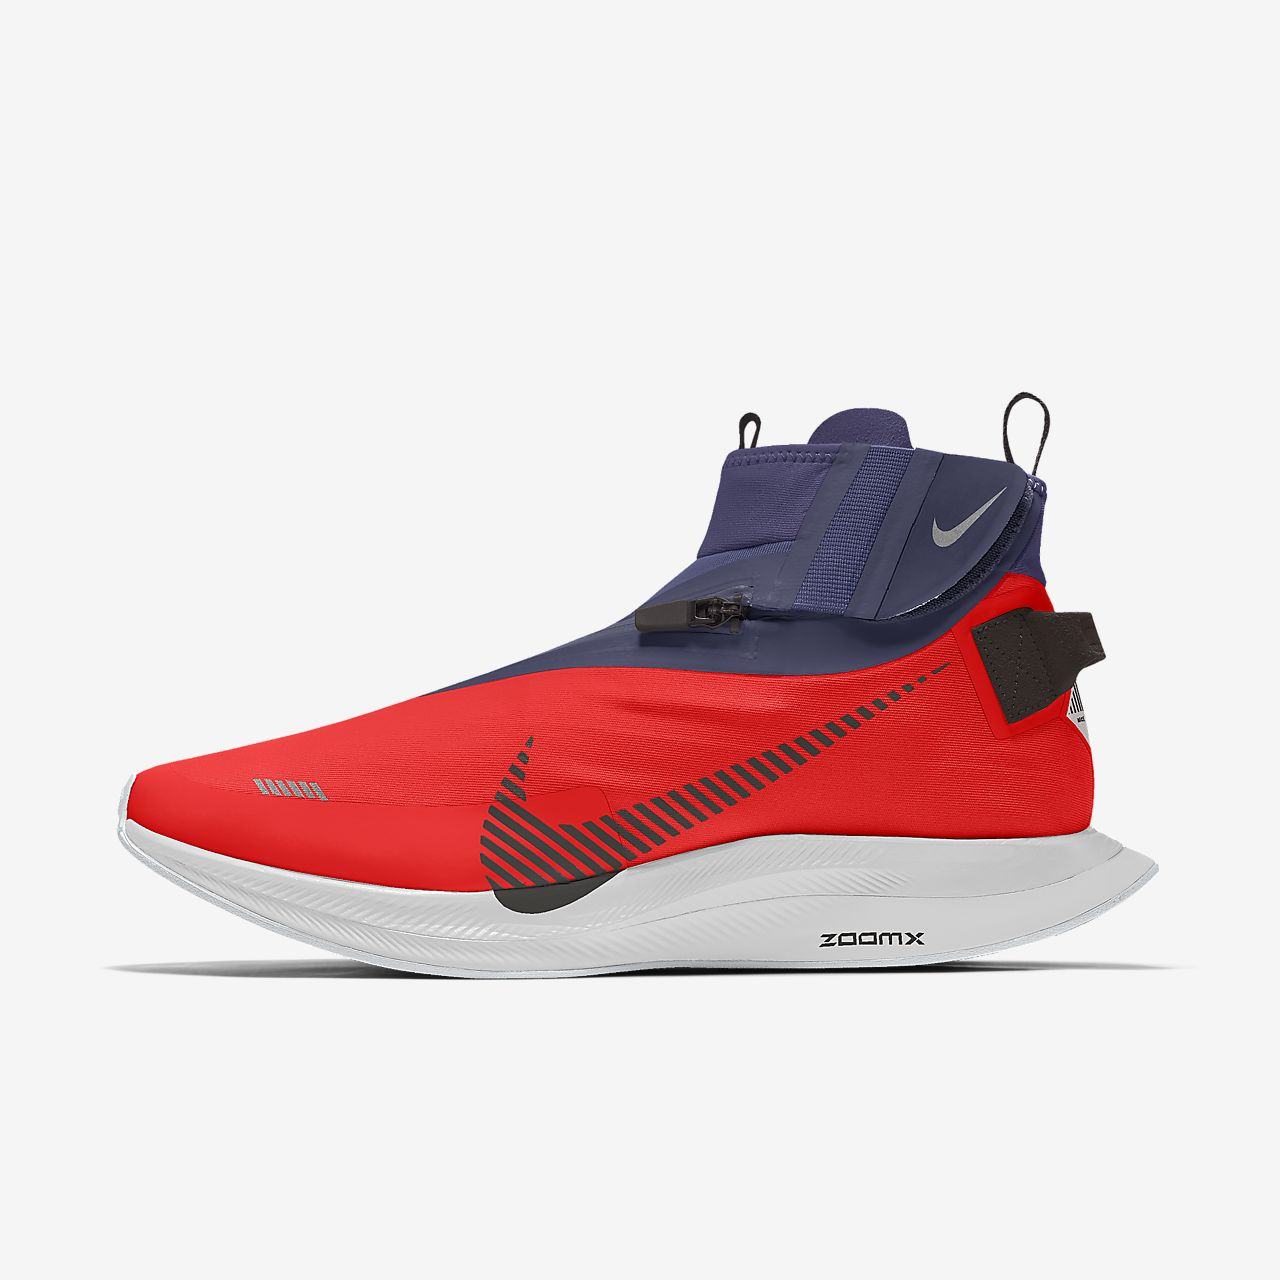 Sapatilhas de running personalizáveis Nike Zoom Pegasus Turbo Shield By You para mulher